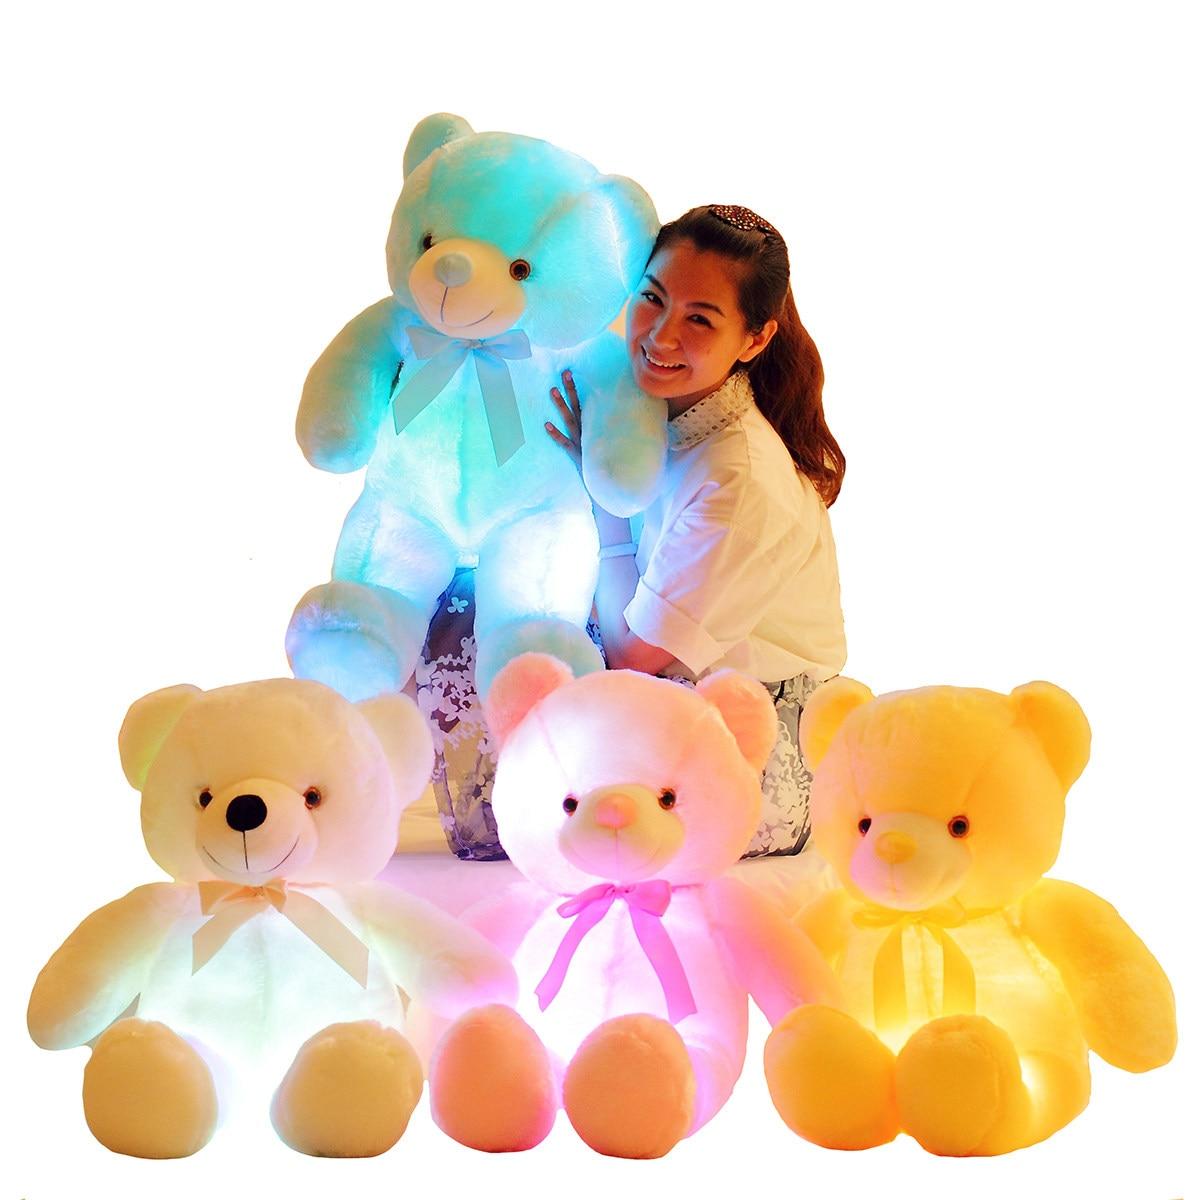 Bookfong 50cm Creative Light Up Led Teddy Bear Stuffed Animals Plush Toy Colorful Glowing Teddy Bear Christmas Gift For Kids Teddy Bear Stuffing Led Teddyplush Toys Aliexpress